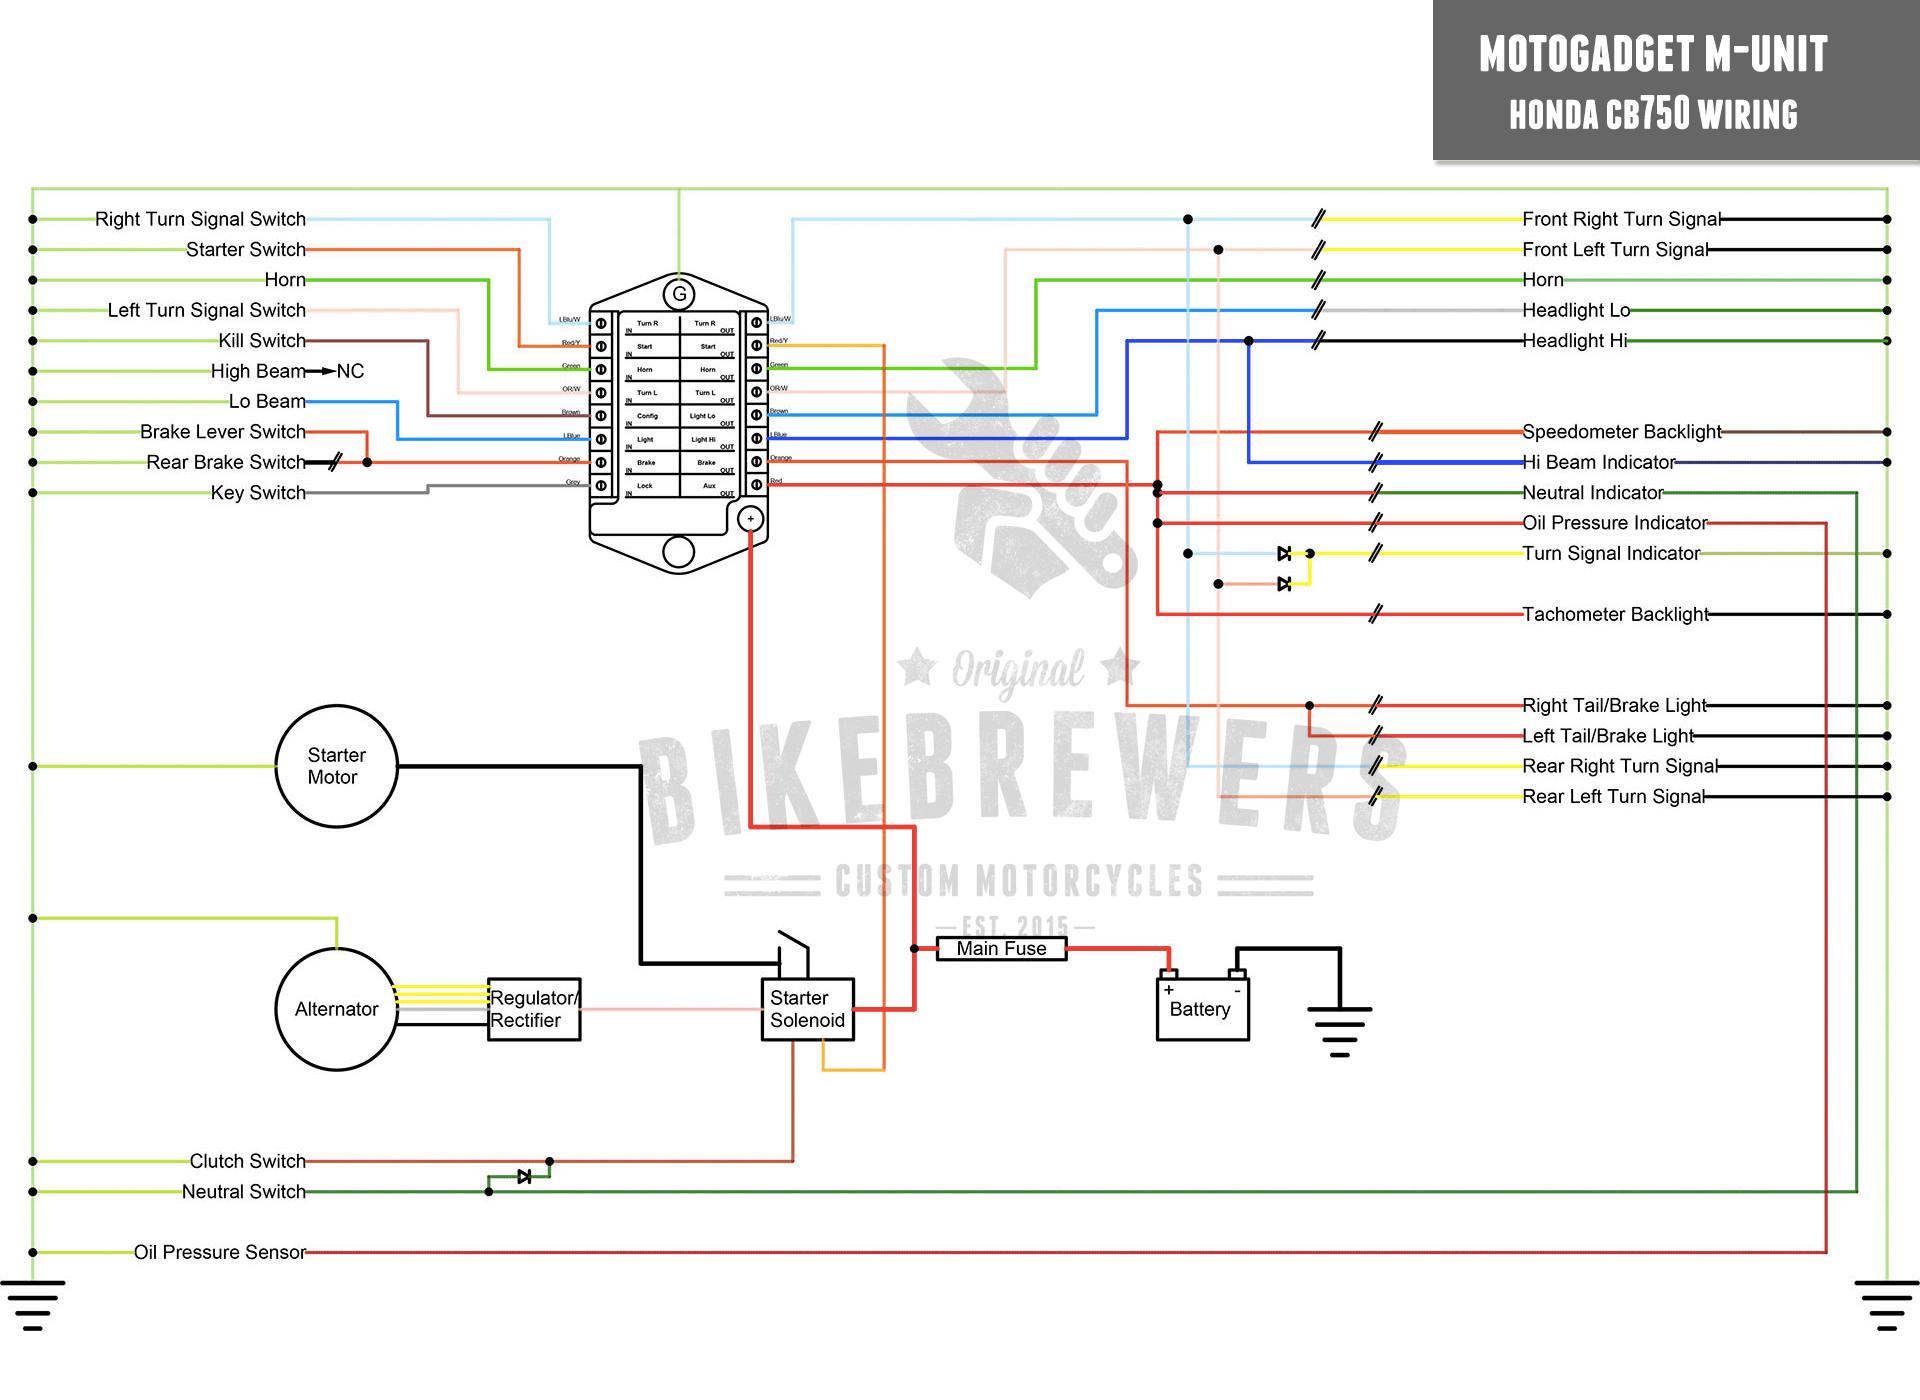 Lovely Wiring Diagram Vespa Excel 150 Diagrams Digramssample Diagramimages Wiringdiagramsample Wiringdiagram Check More At Https Honda Cb750 Cb750 Honda